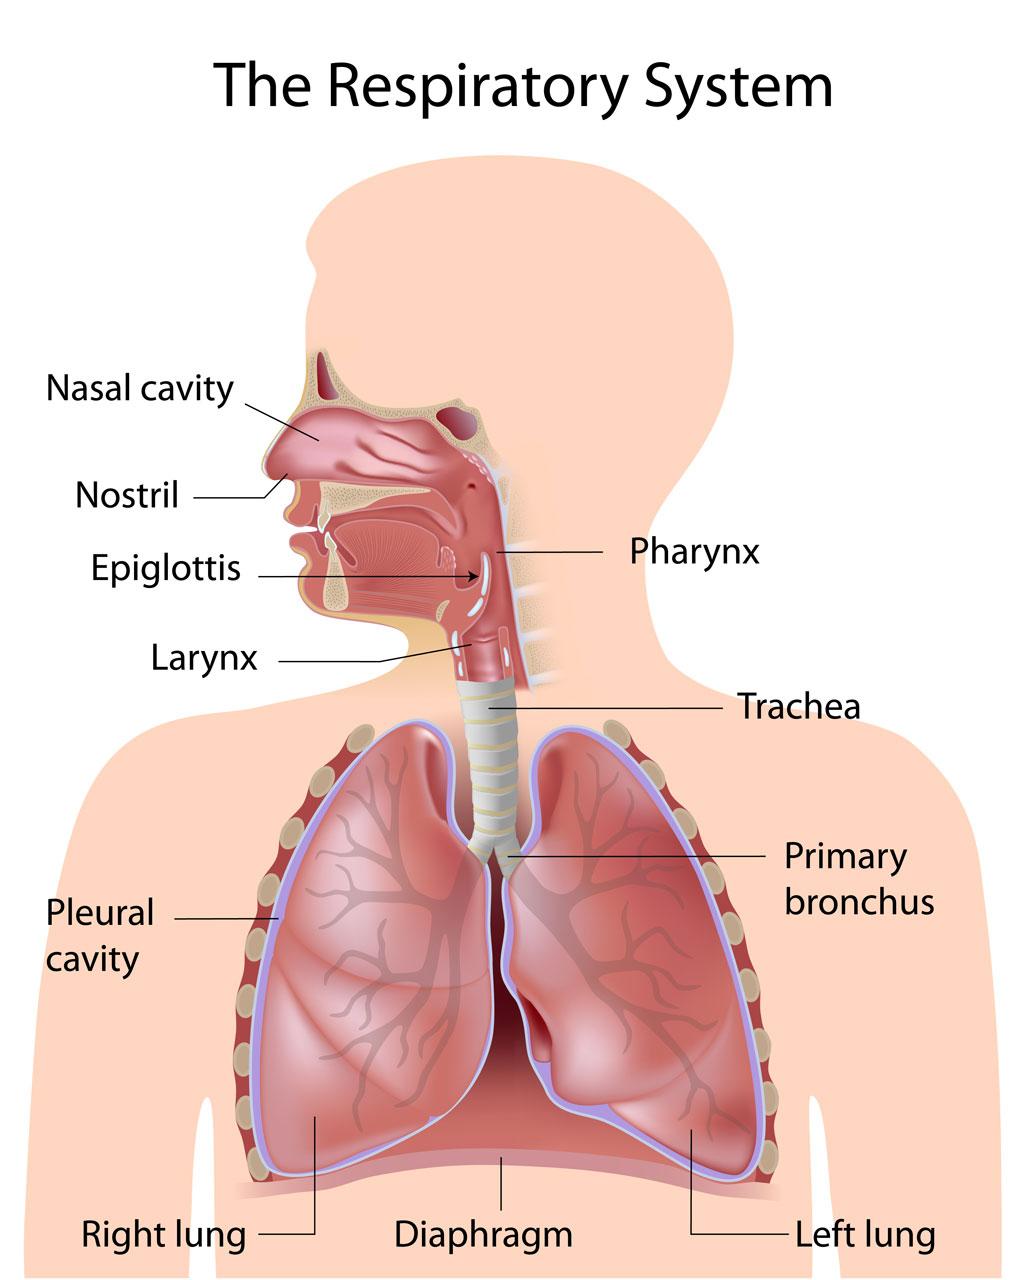 Child respiratory system - Pediatric Pulmonologists